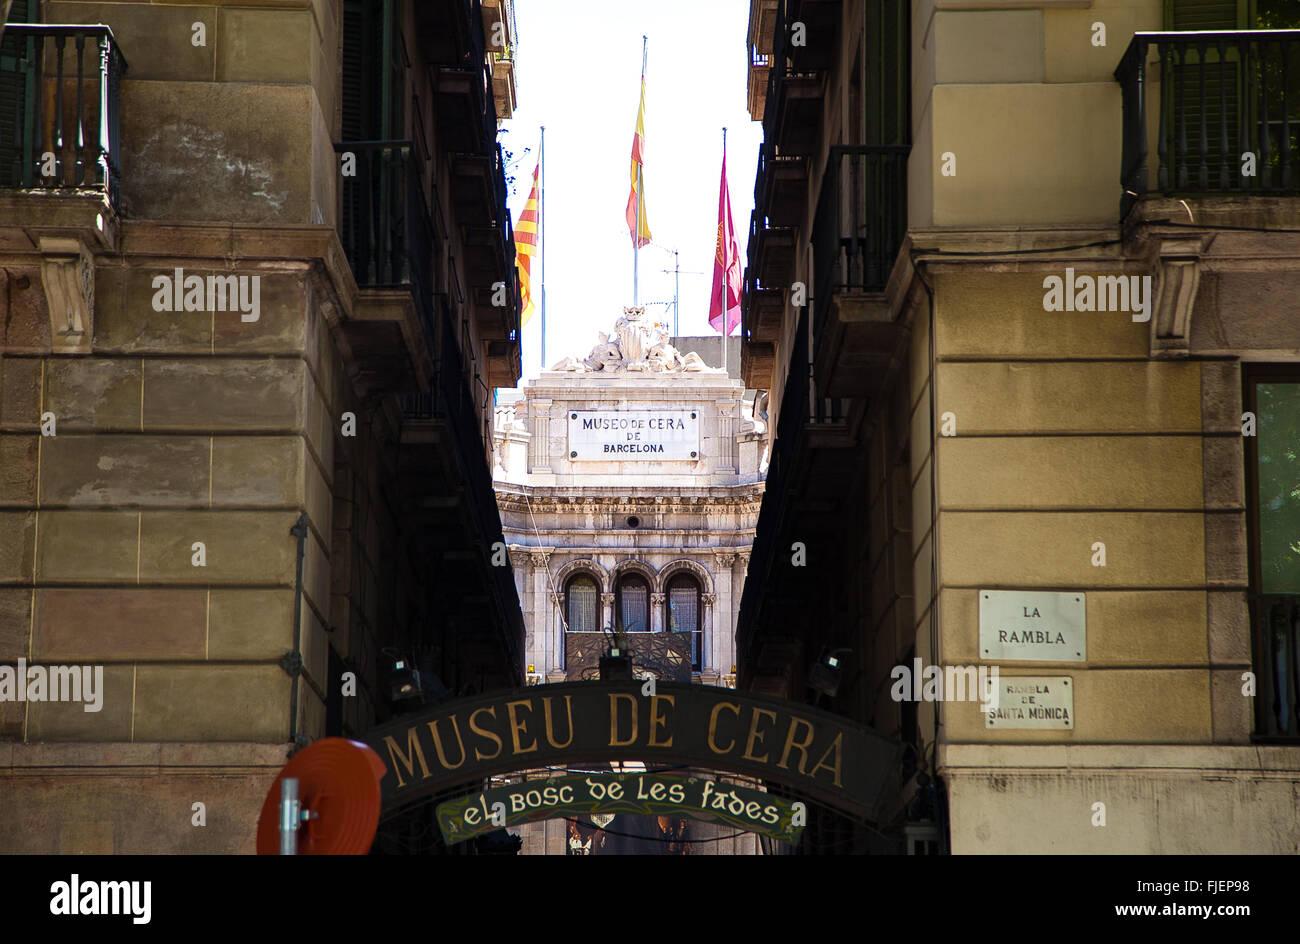 A Wax Museum - Museo de cera de in Barcelona - Stock Image